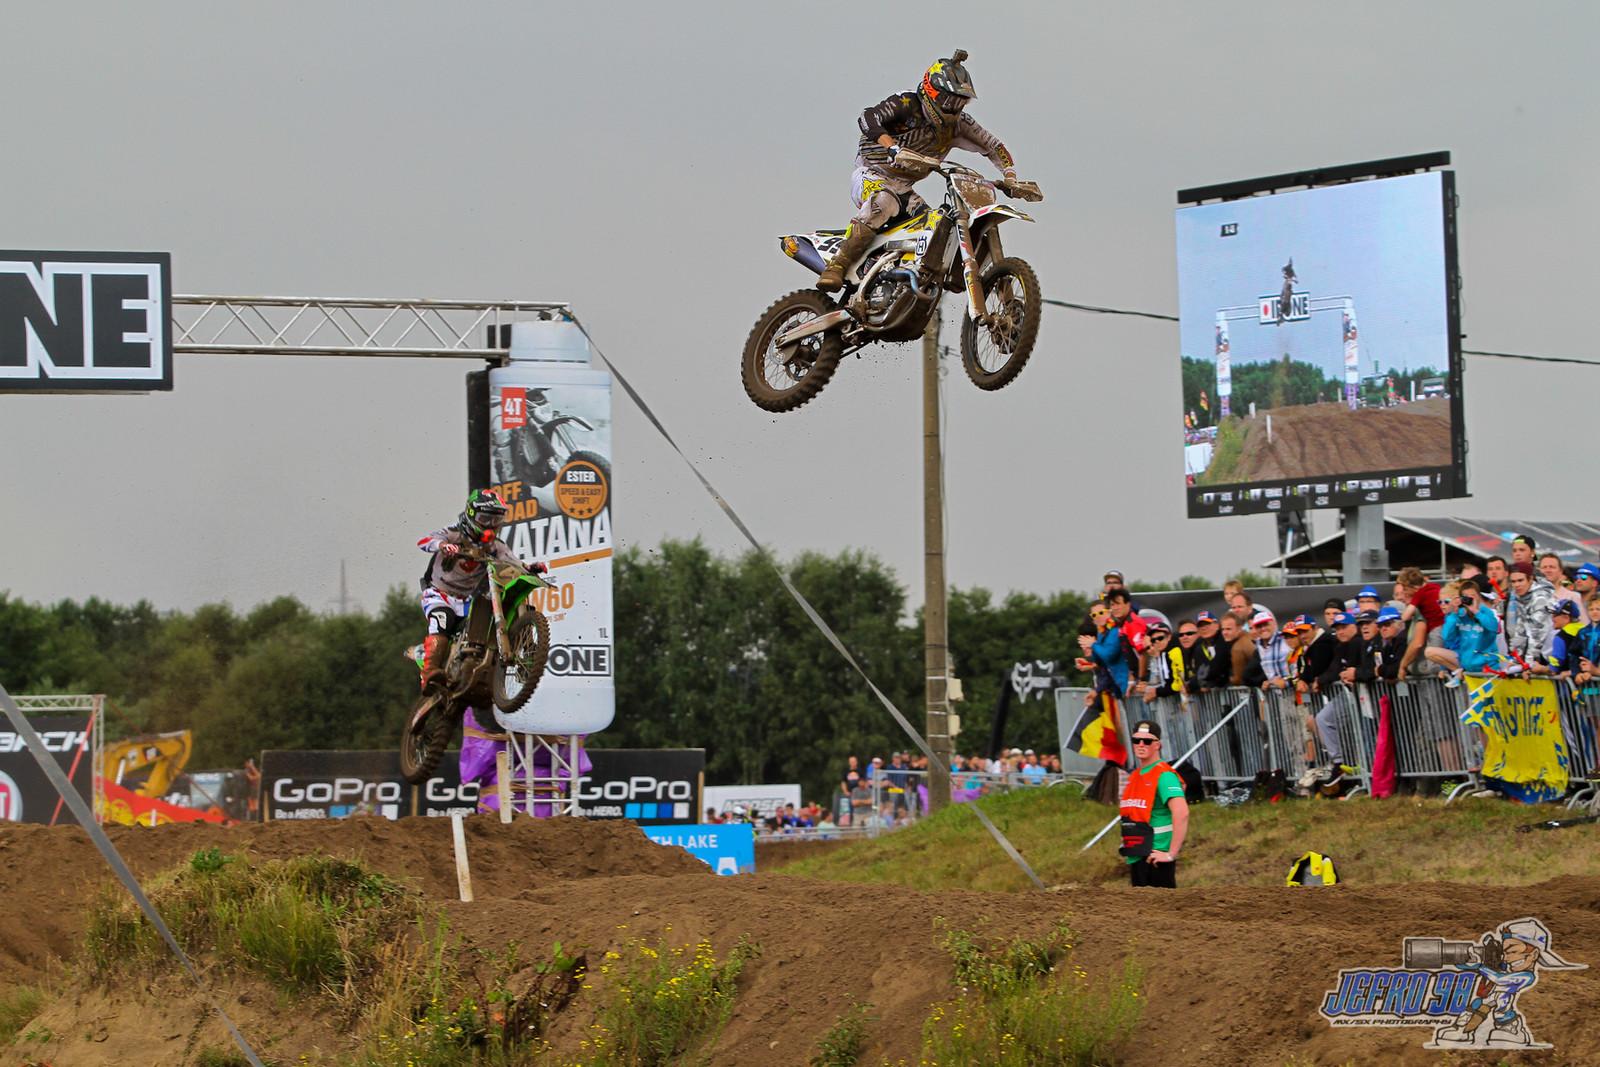 Max Anstie - Photo Gallery: MXGP of Limburg - Motocross Pictures - Vital MX